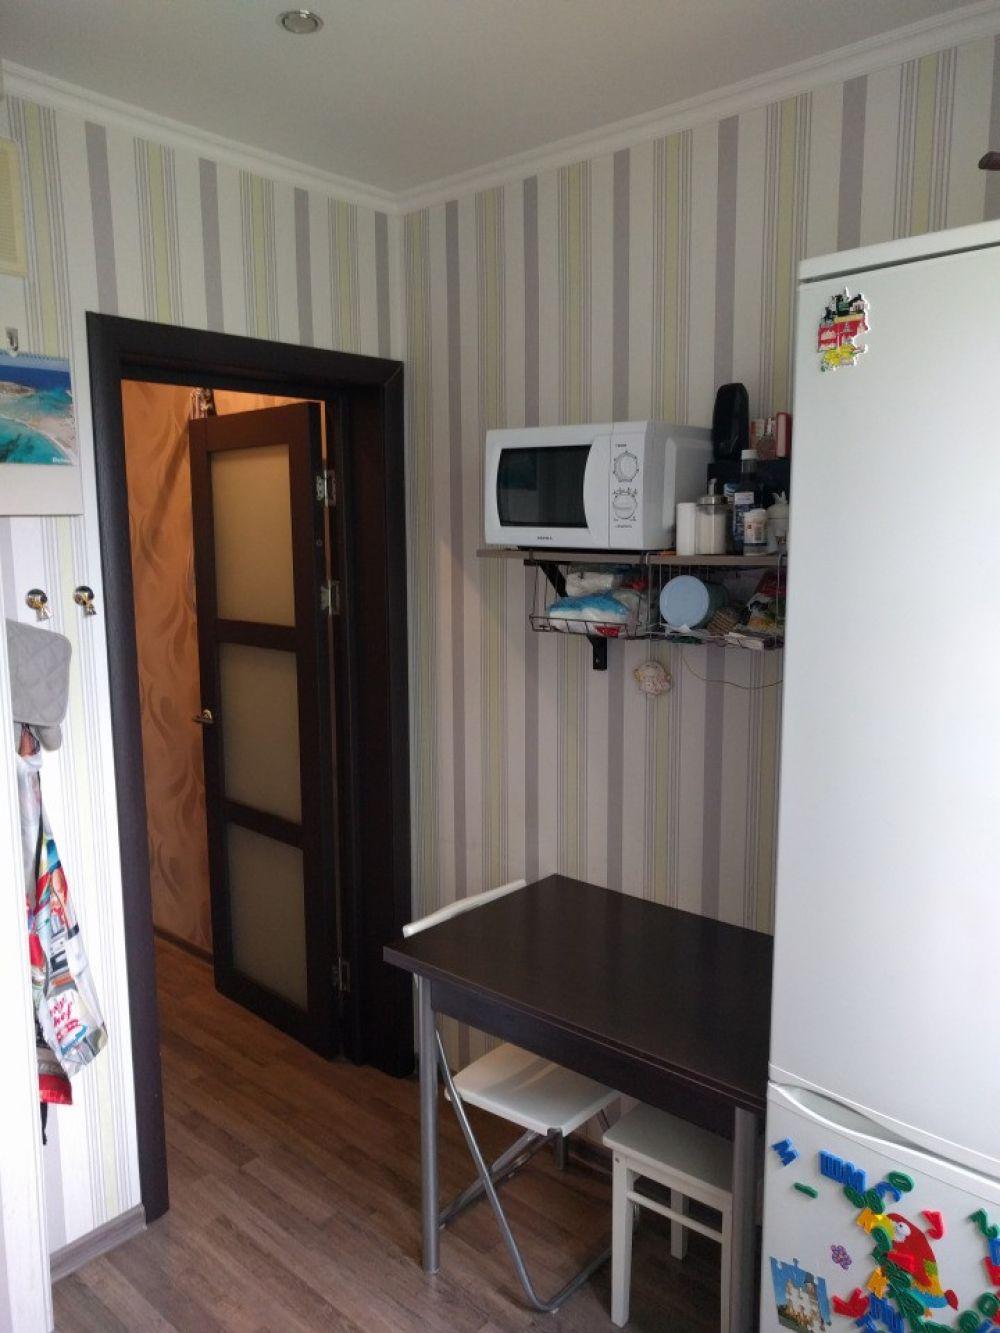 1-к квартира, Щелково, Парковая улица, 9А, фото 5